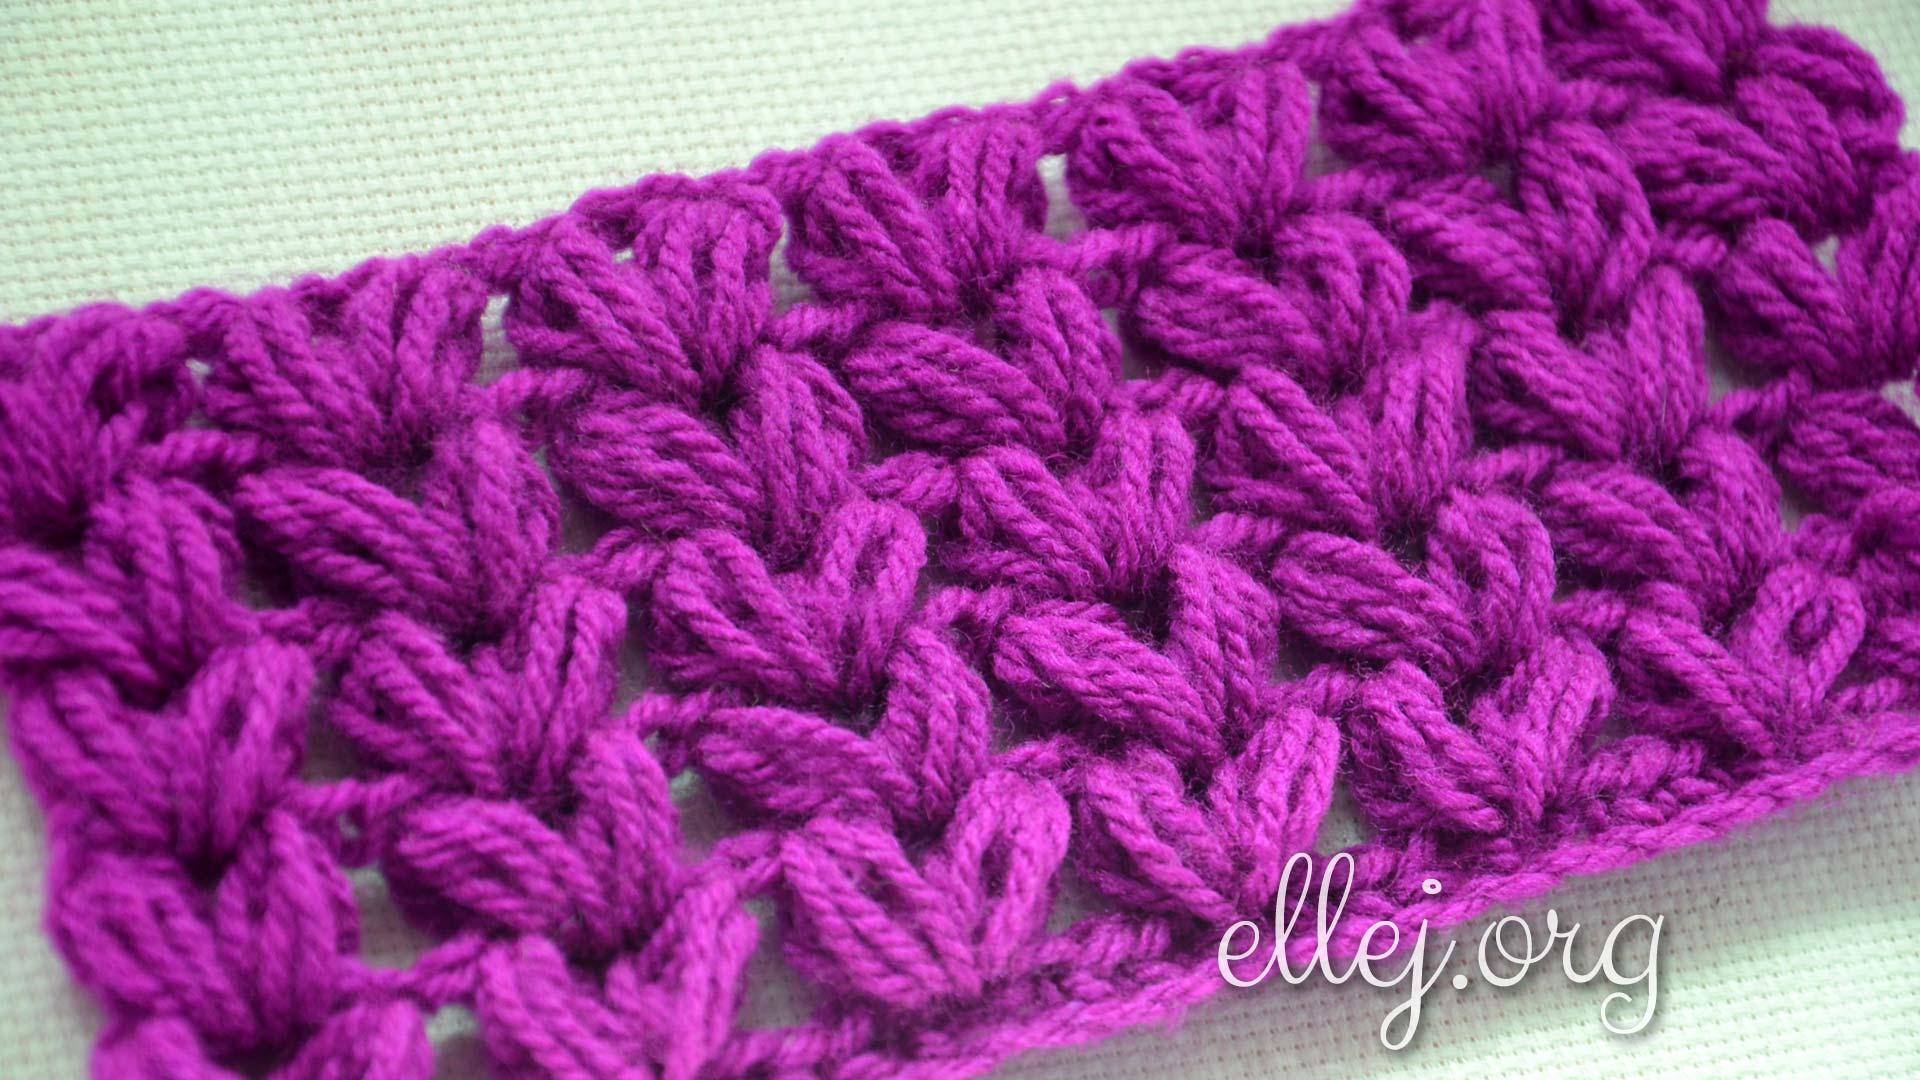 Puff Crochet Stitch Tutorials Instructions